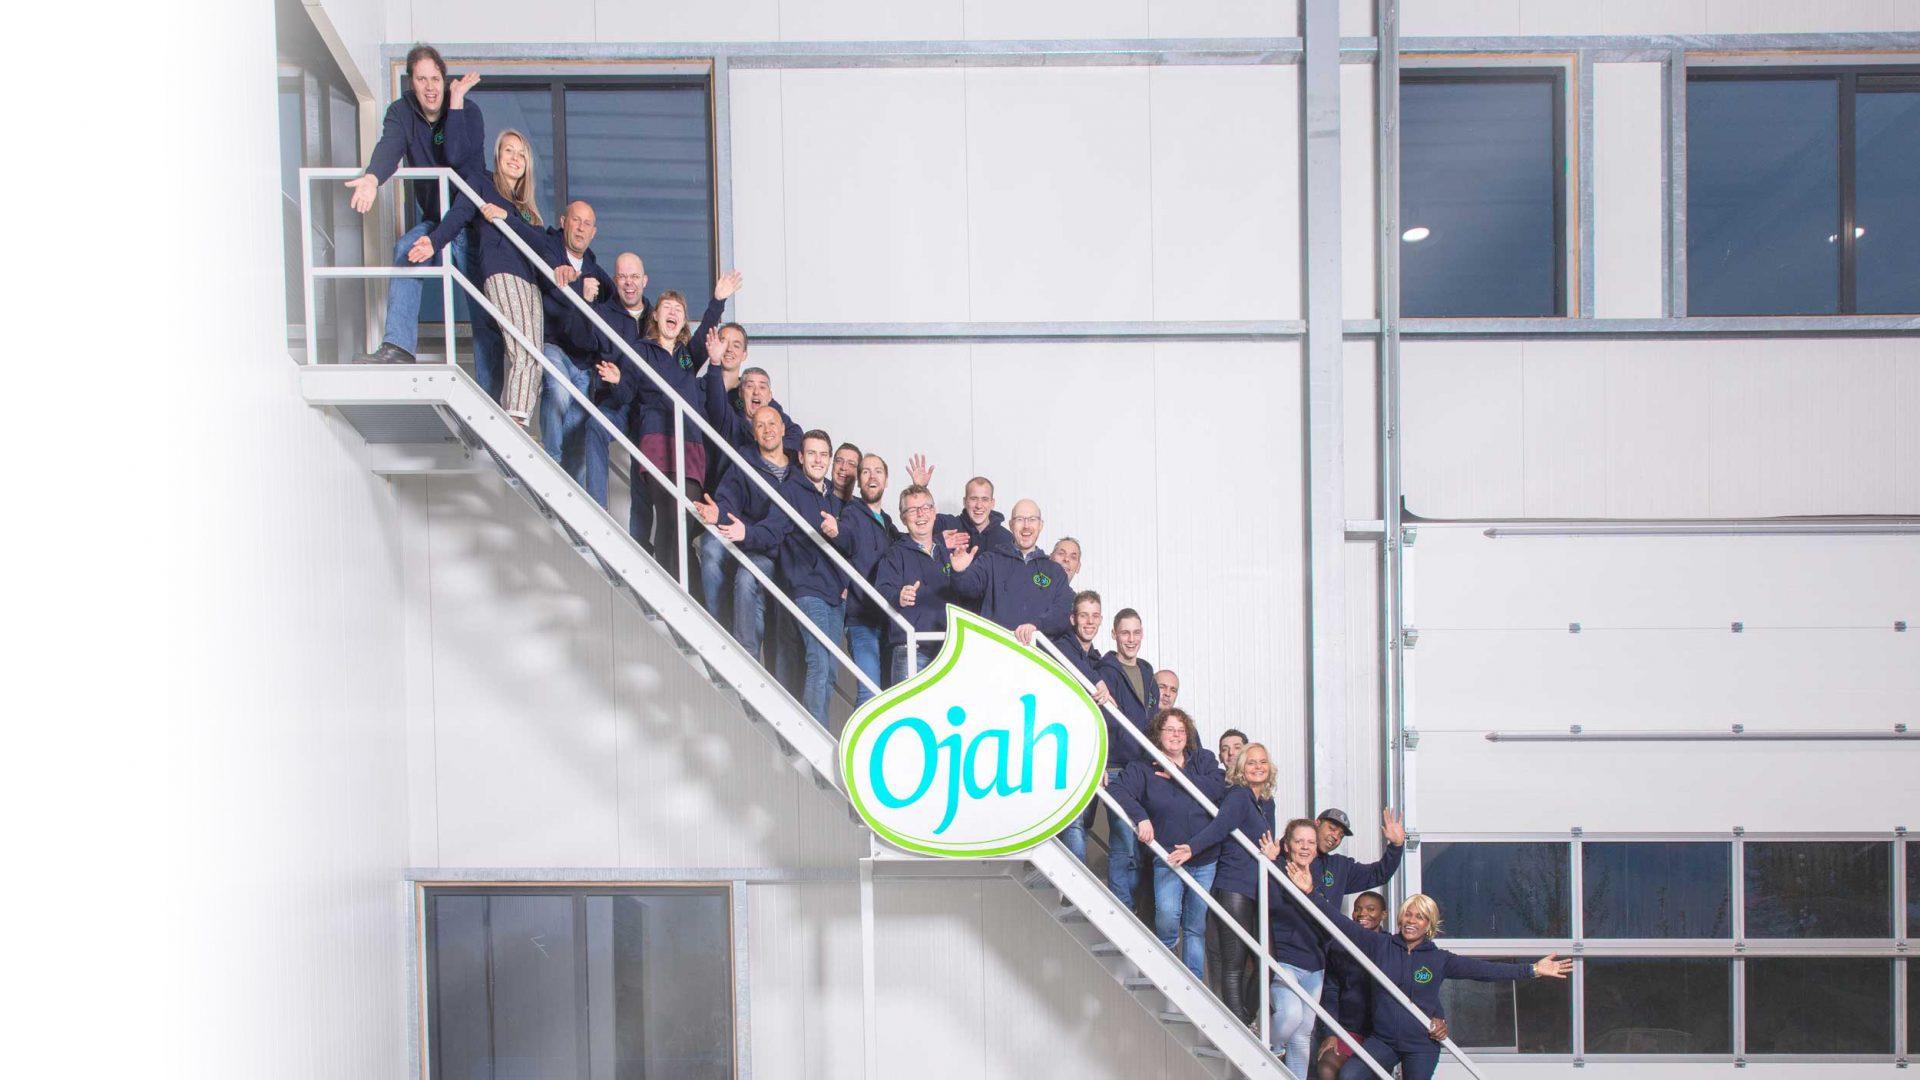 Ojah_Team